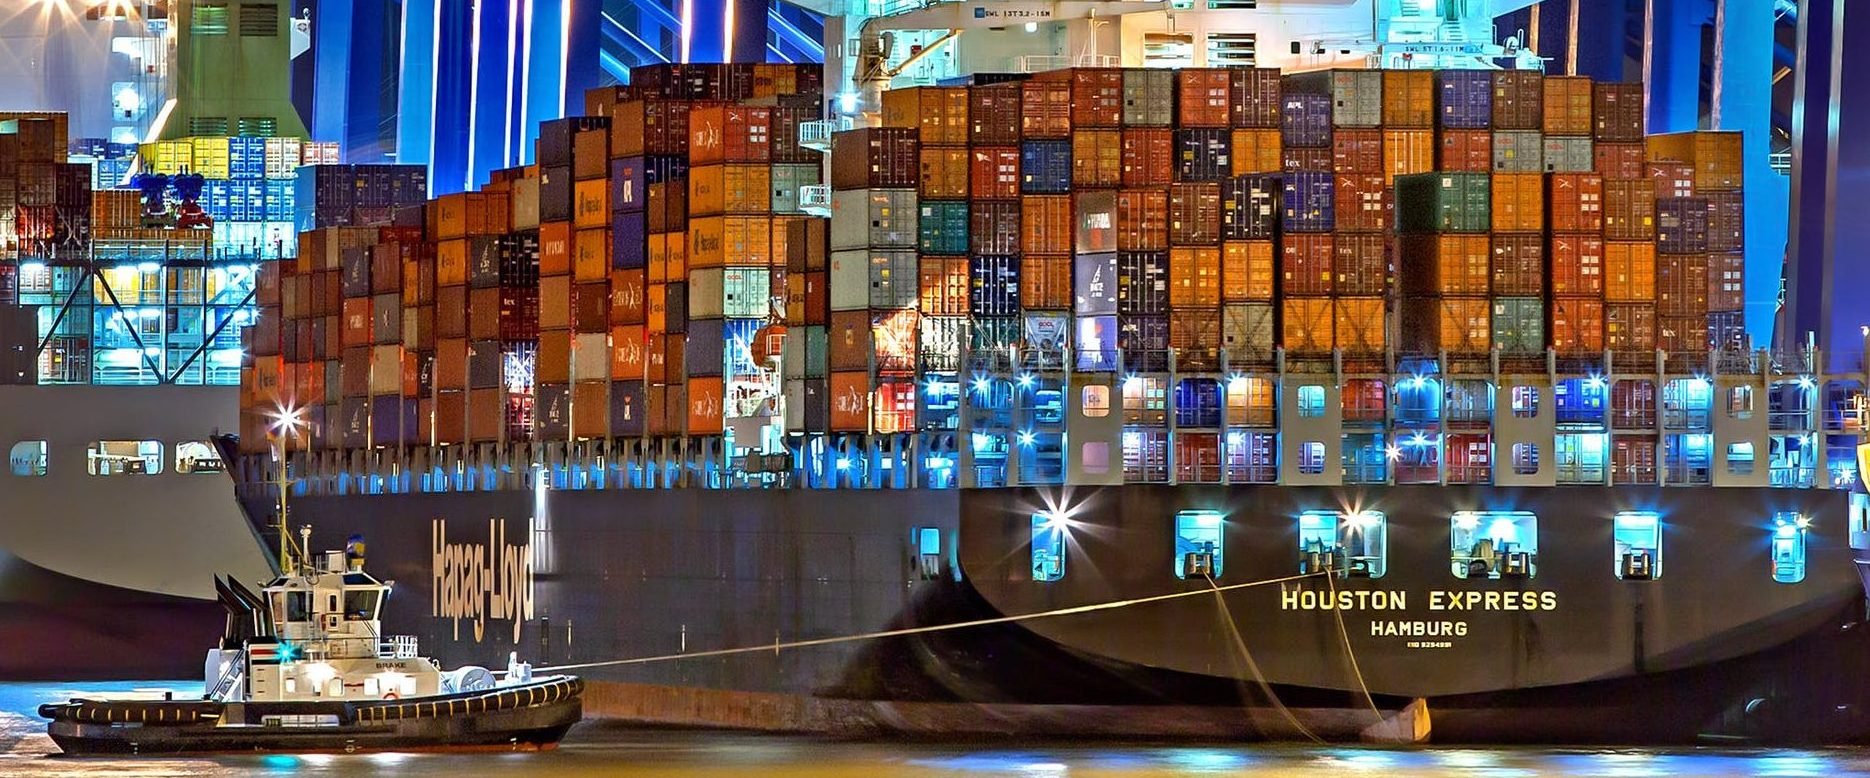 International Freight Forwarding Service | Transmanna International Inc